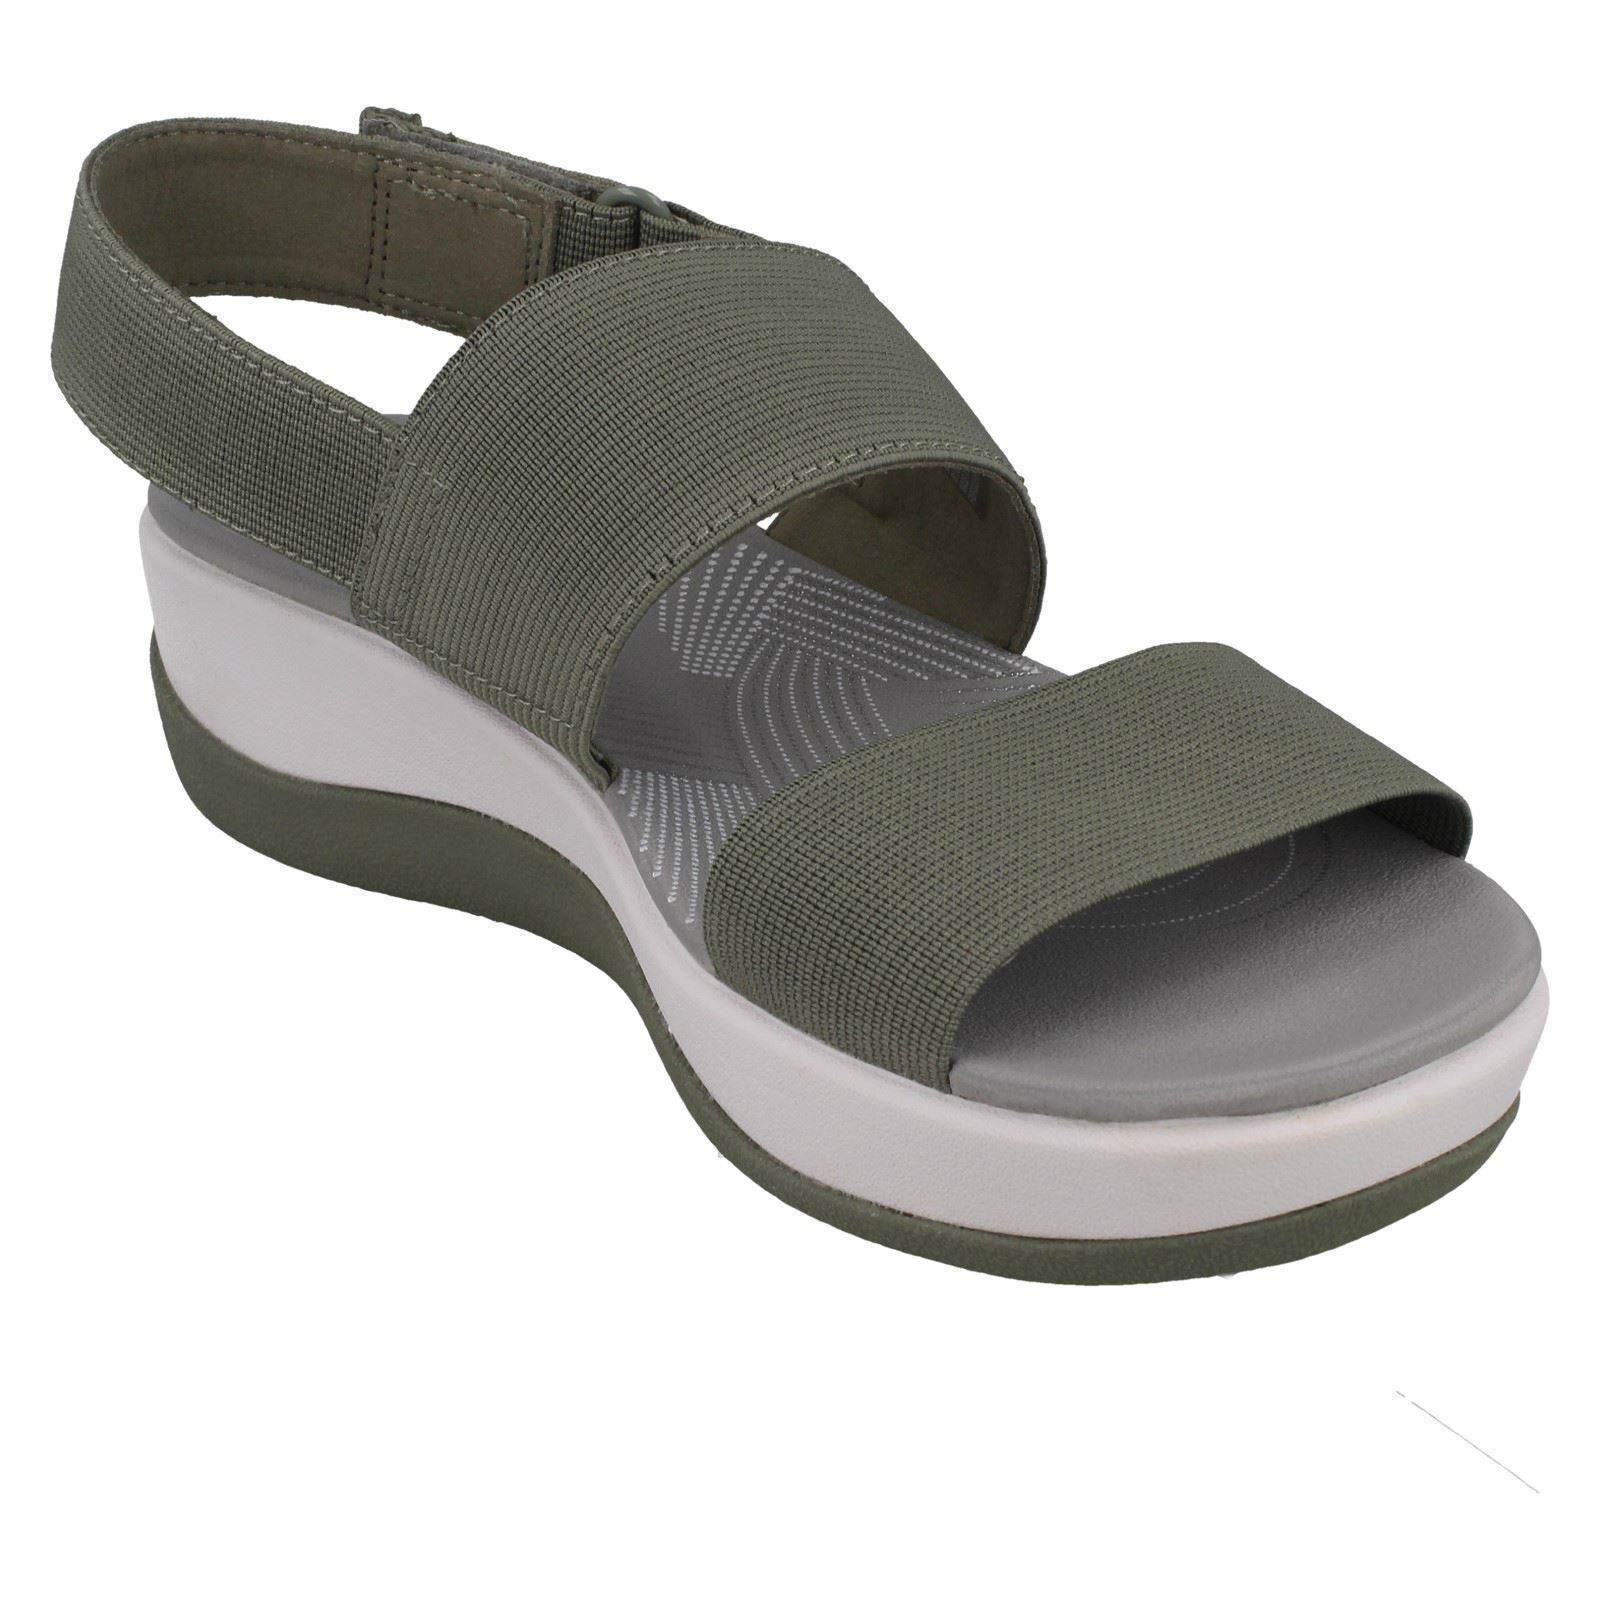 Ladies Clarks Slingback Sandal /'Arla Jacory/'